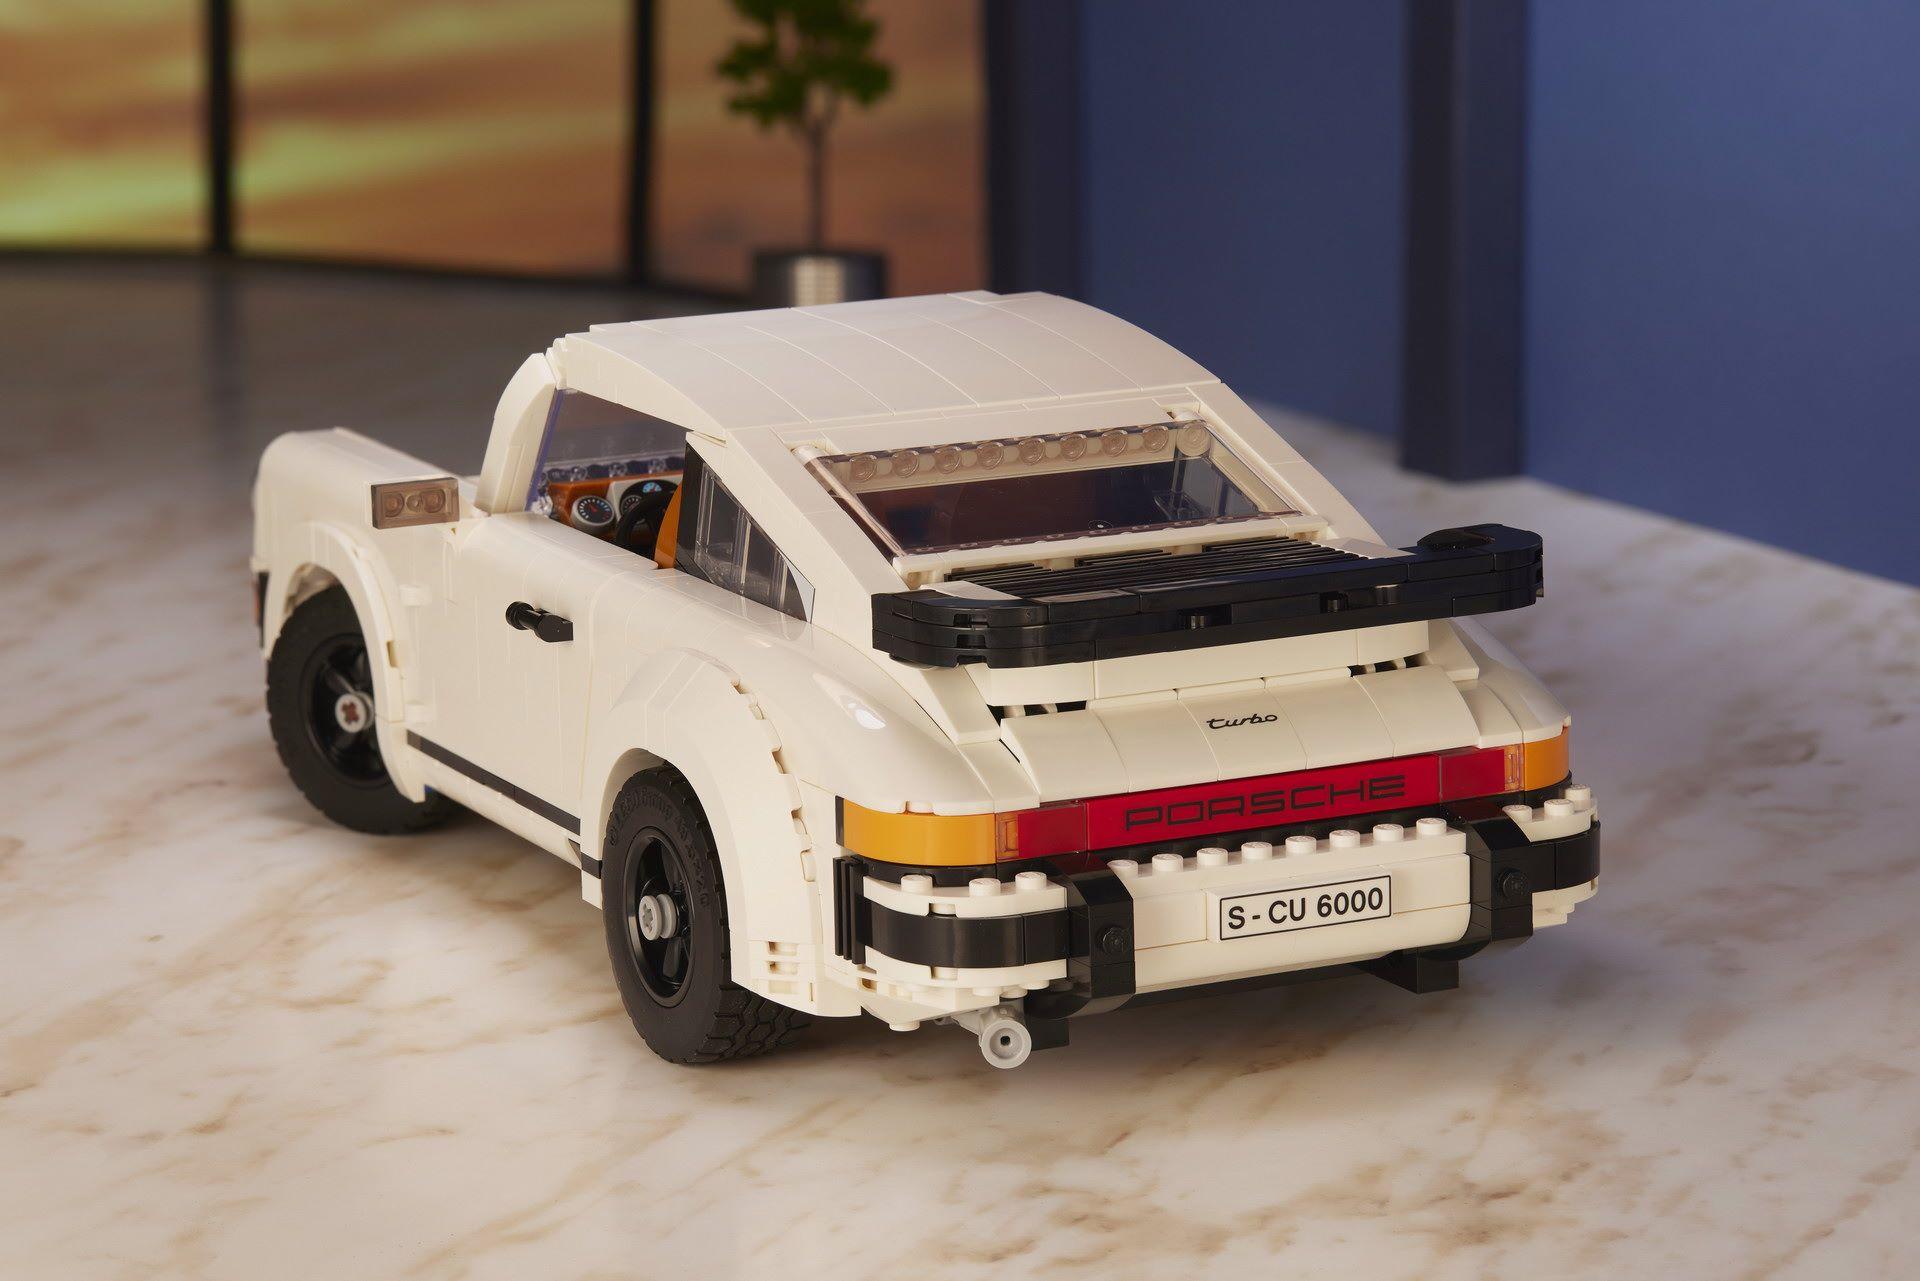 Porsche-911-Turbo-and-Targa-kit-2